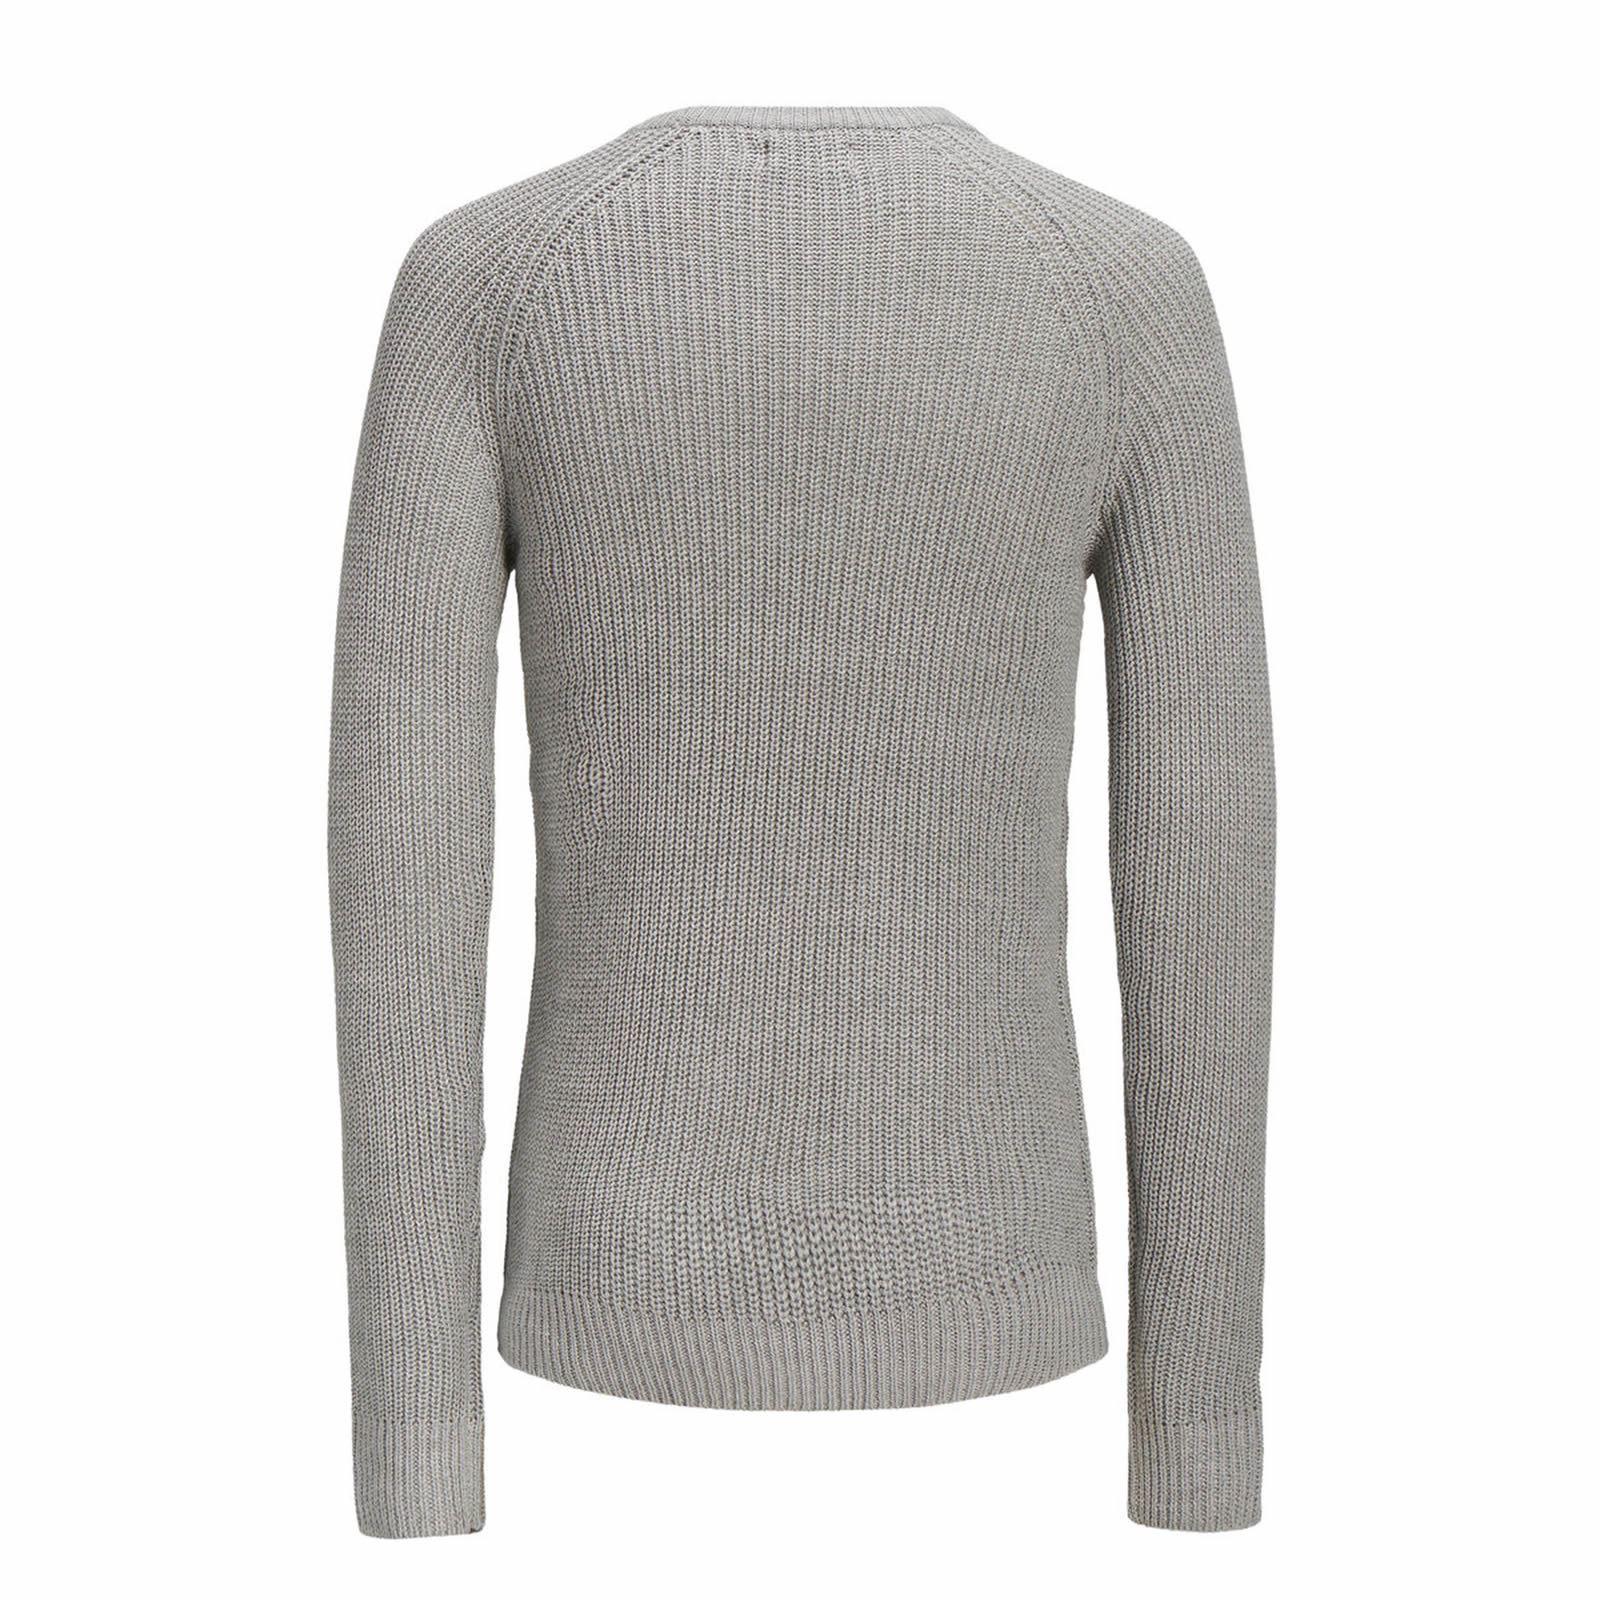 Jack-amp-Jones-Panneau-Pull-homme-a-encolure-ras-du-cou-Long-Tricot-Pull-Over-Sweater miniature 3